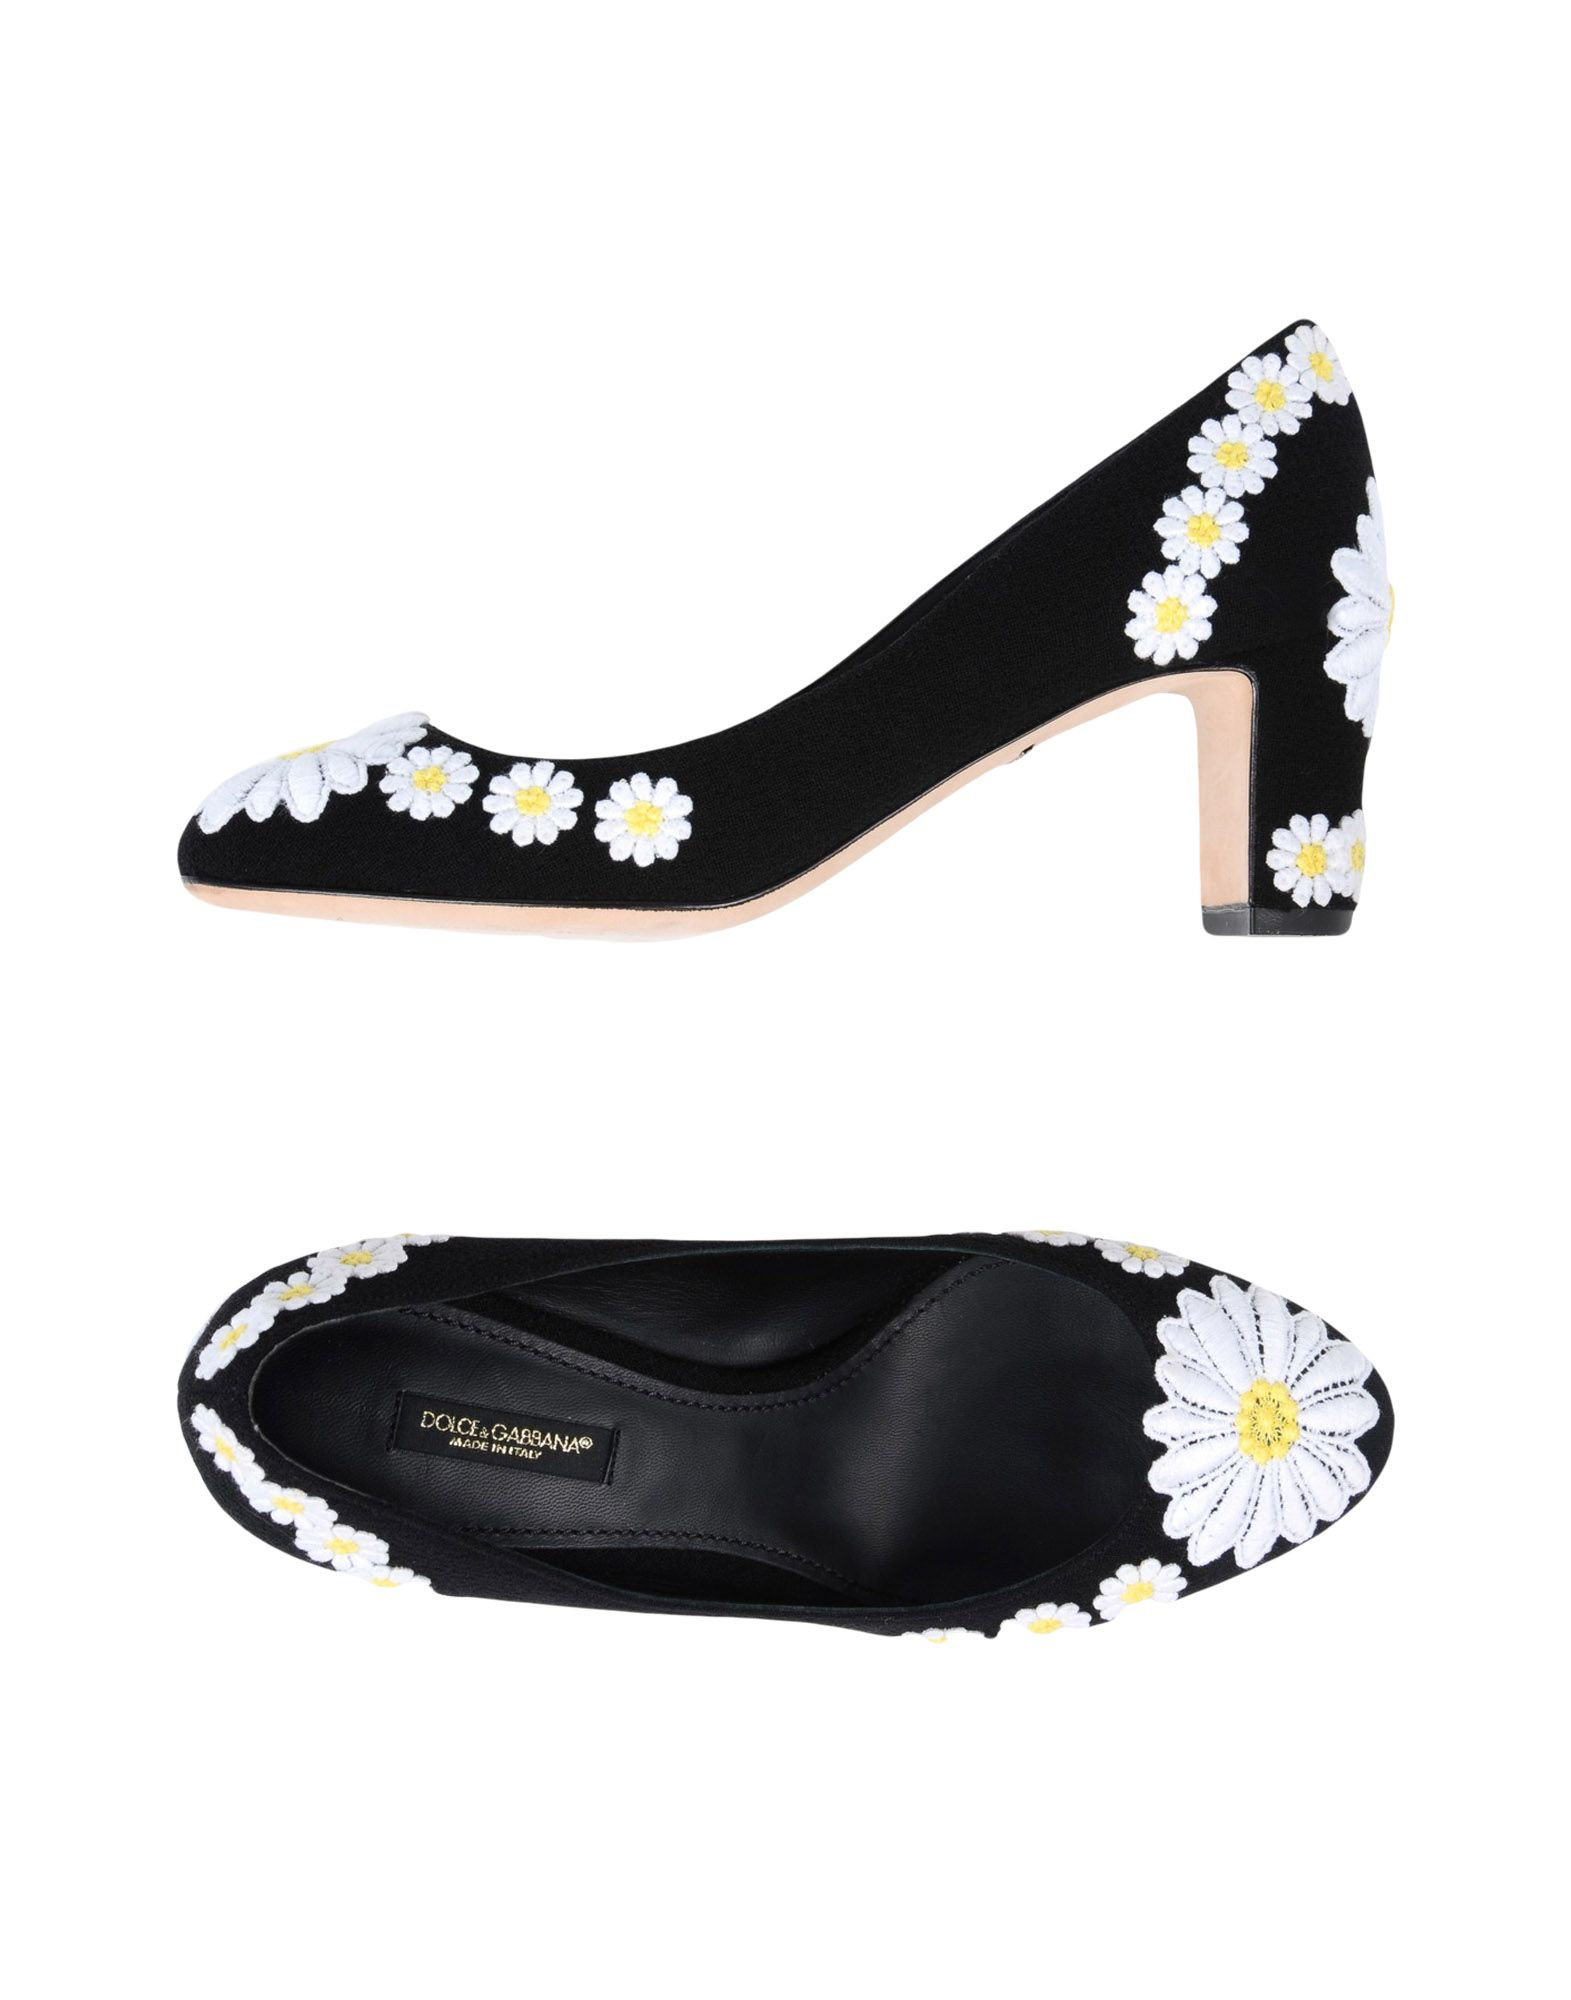 Dolce Damen & Gabbana Pumps Damen Dolce  11508383LV Neue Schuhe 26087f